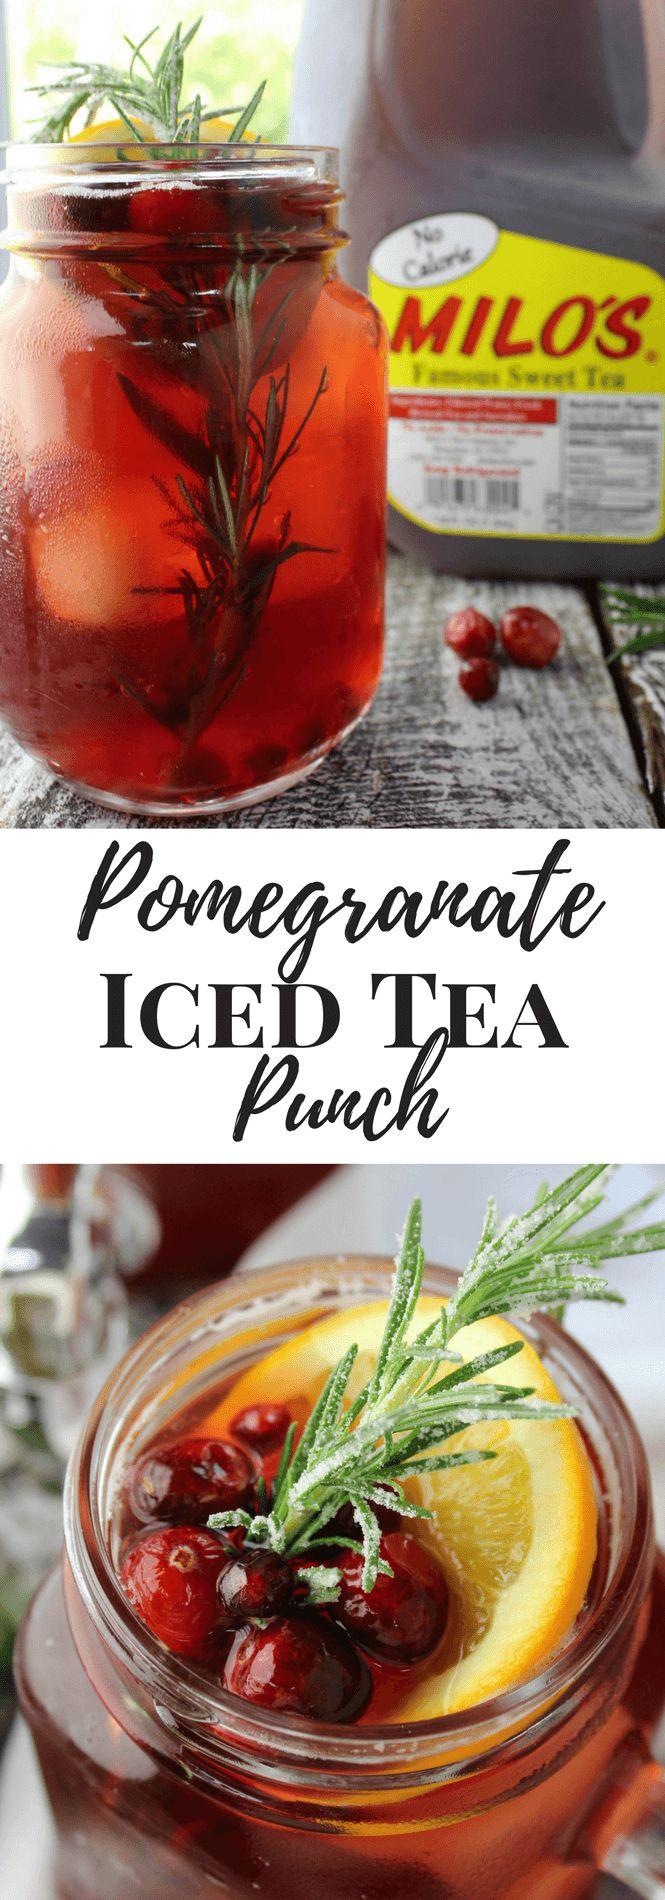 Pomegranate Iced Tea Punch made with Milo's Tea. #PassTheMilos #Pmedia #ad